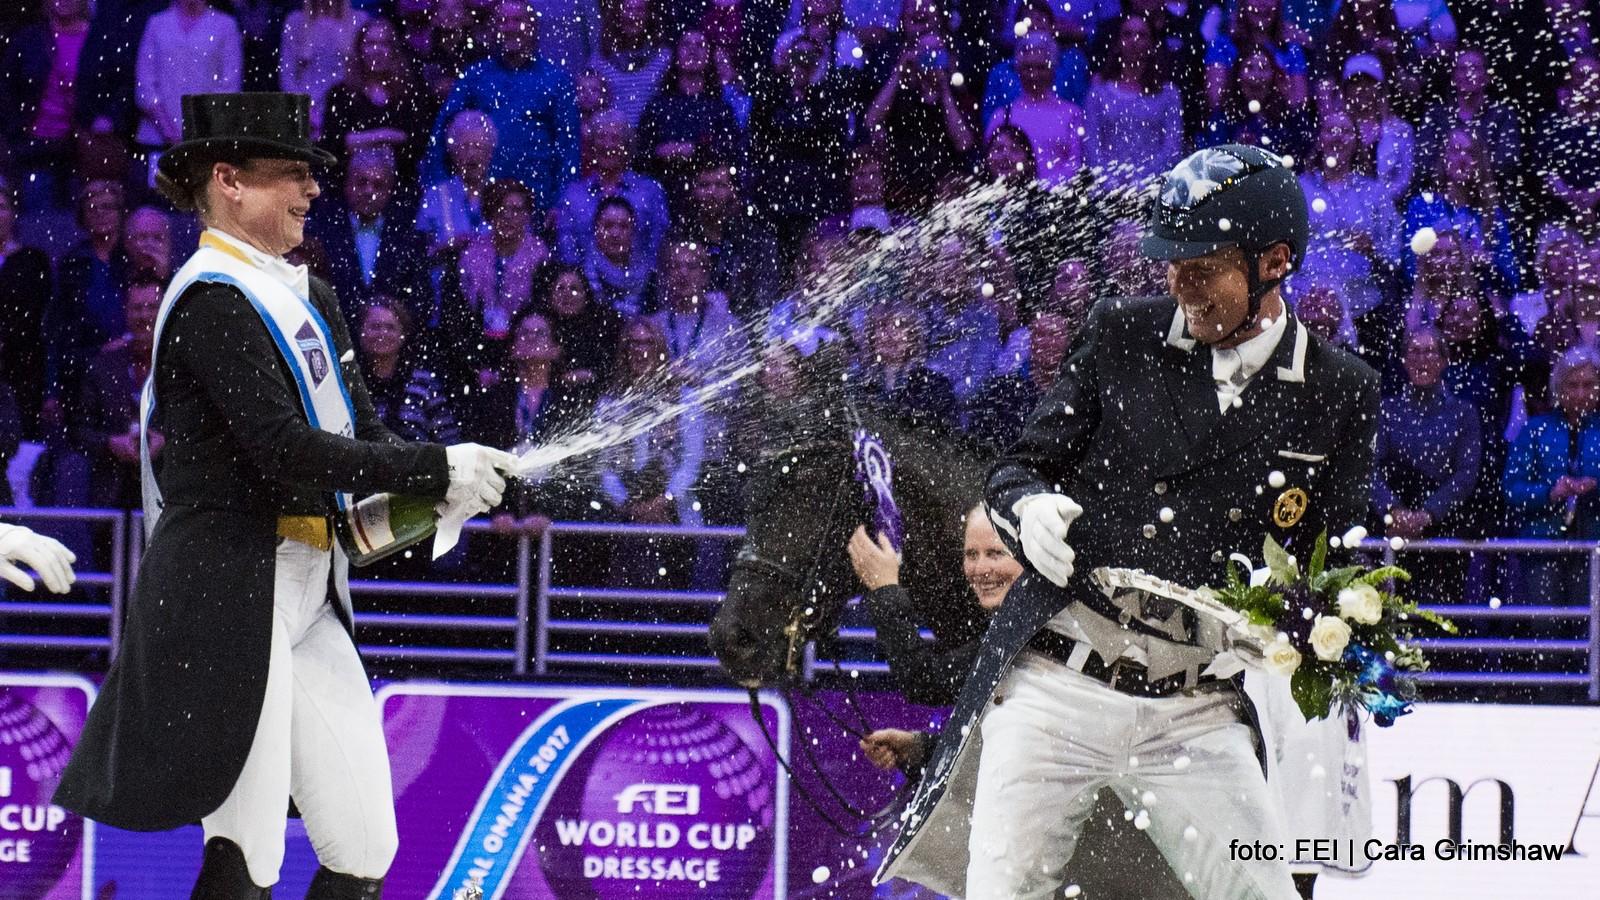 finale wereldbeker dressuur. Isabell Werth laat de champagne vloeien na haar overwinning. Carl Hester (derde) houdt het niet droog. foto: FEI | Cara Grimshaw